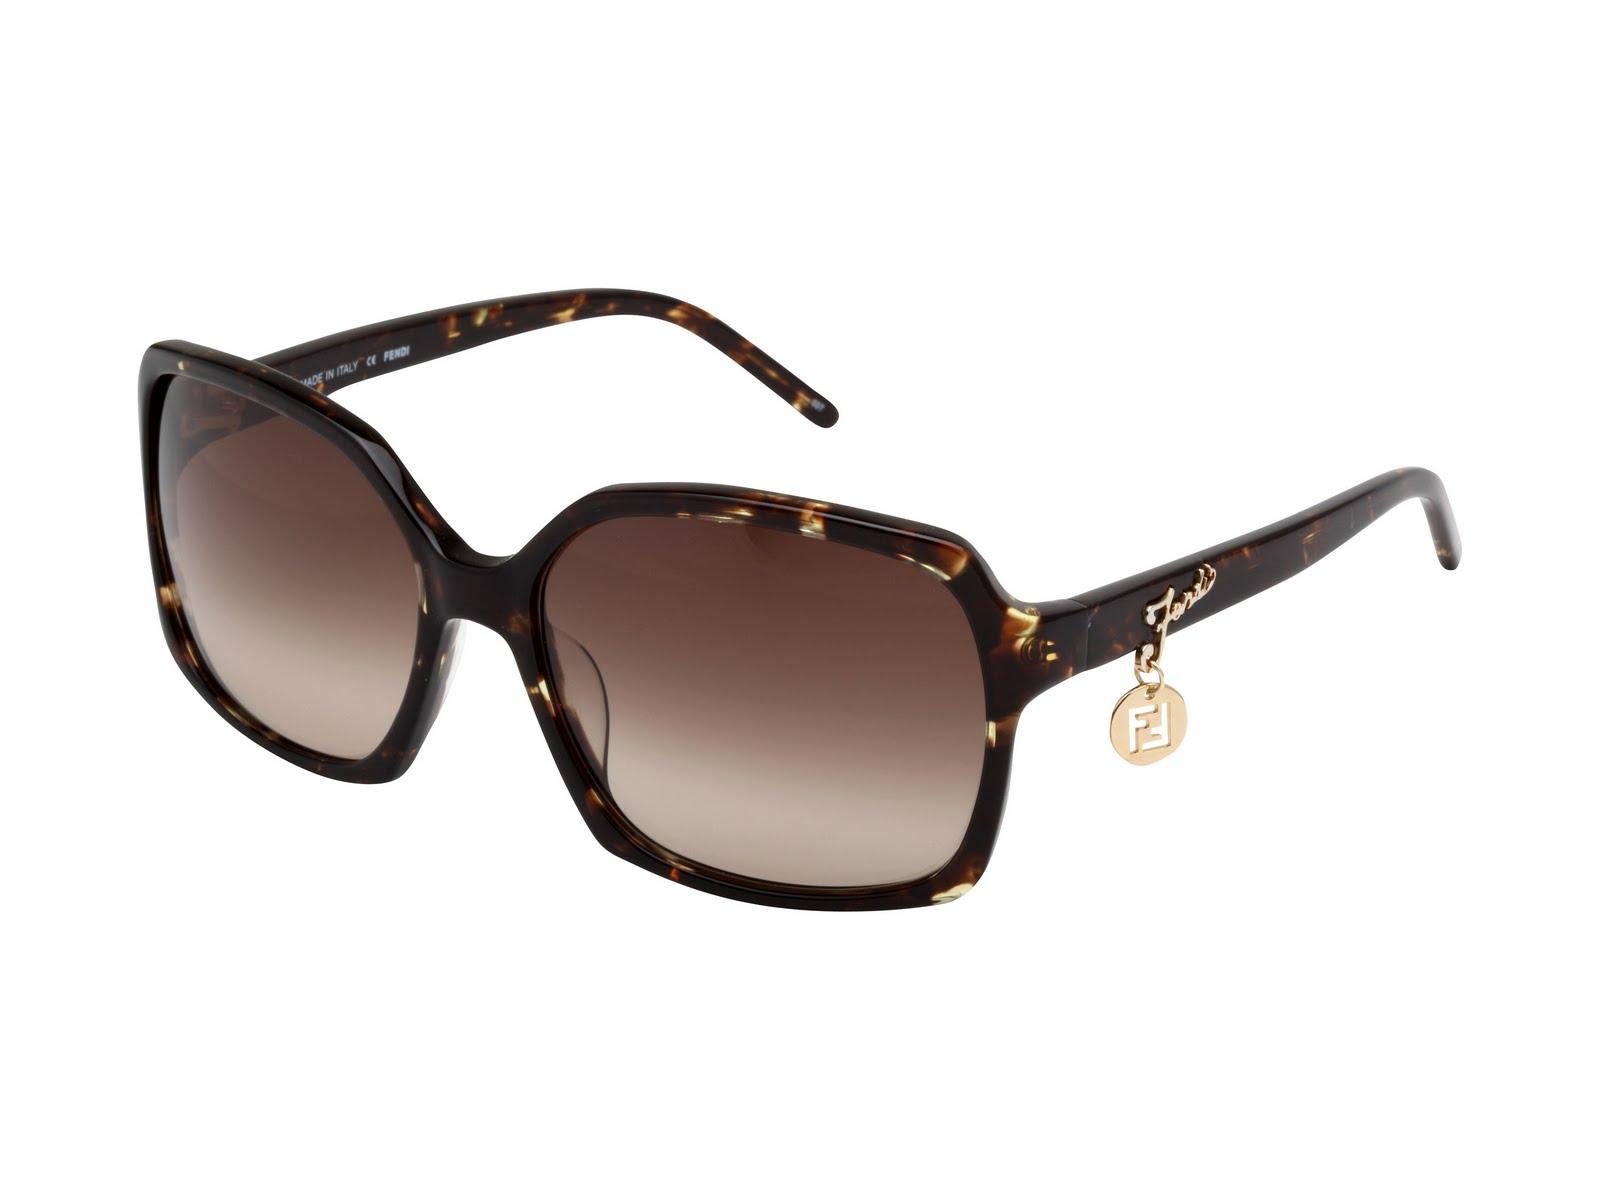 casual dress jackets for men New FENDI Sunglasses FS 5137 215 Havana Brown Women